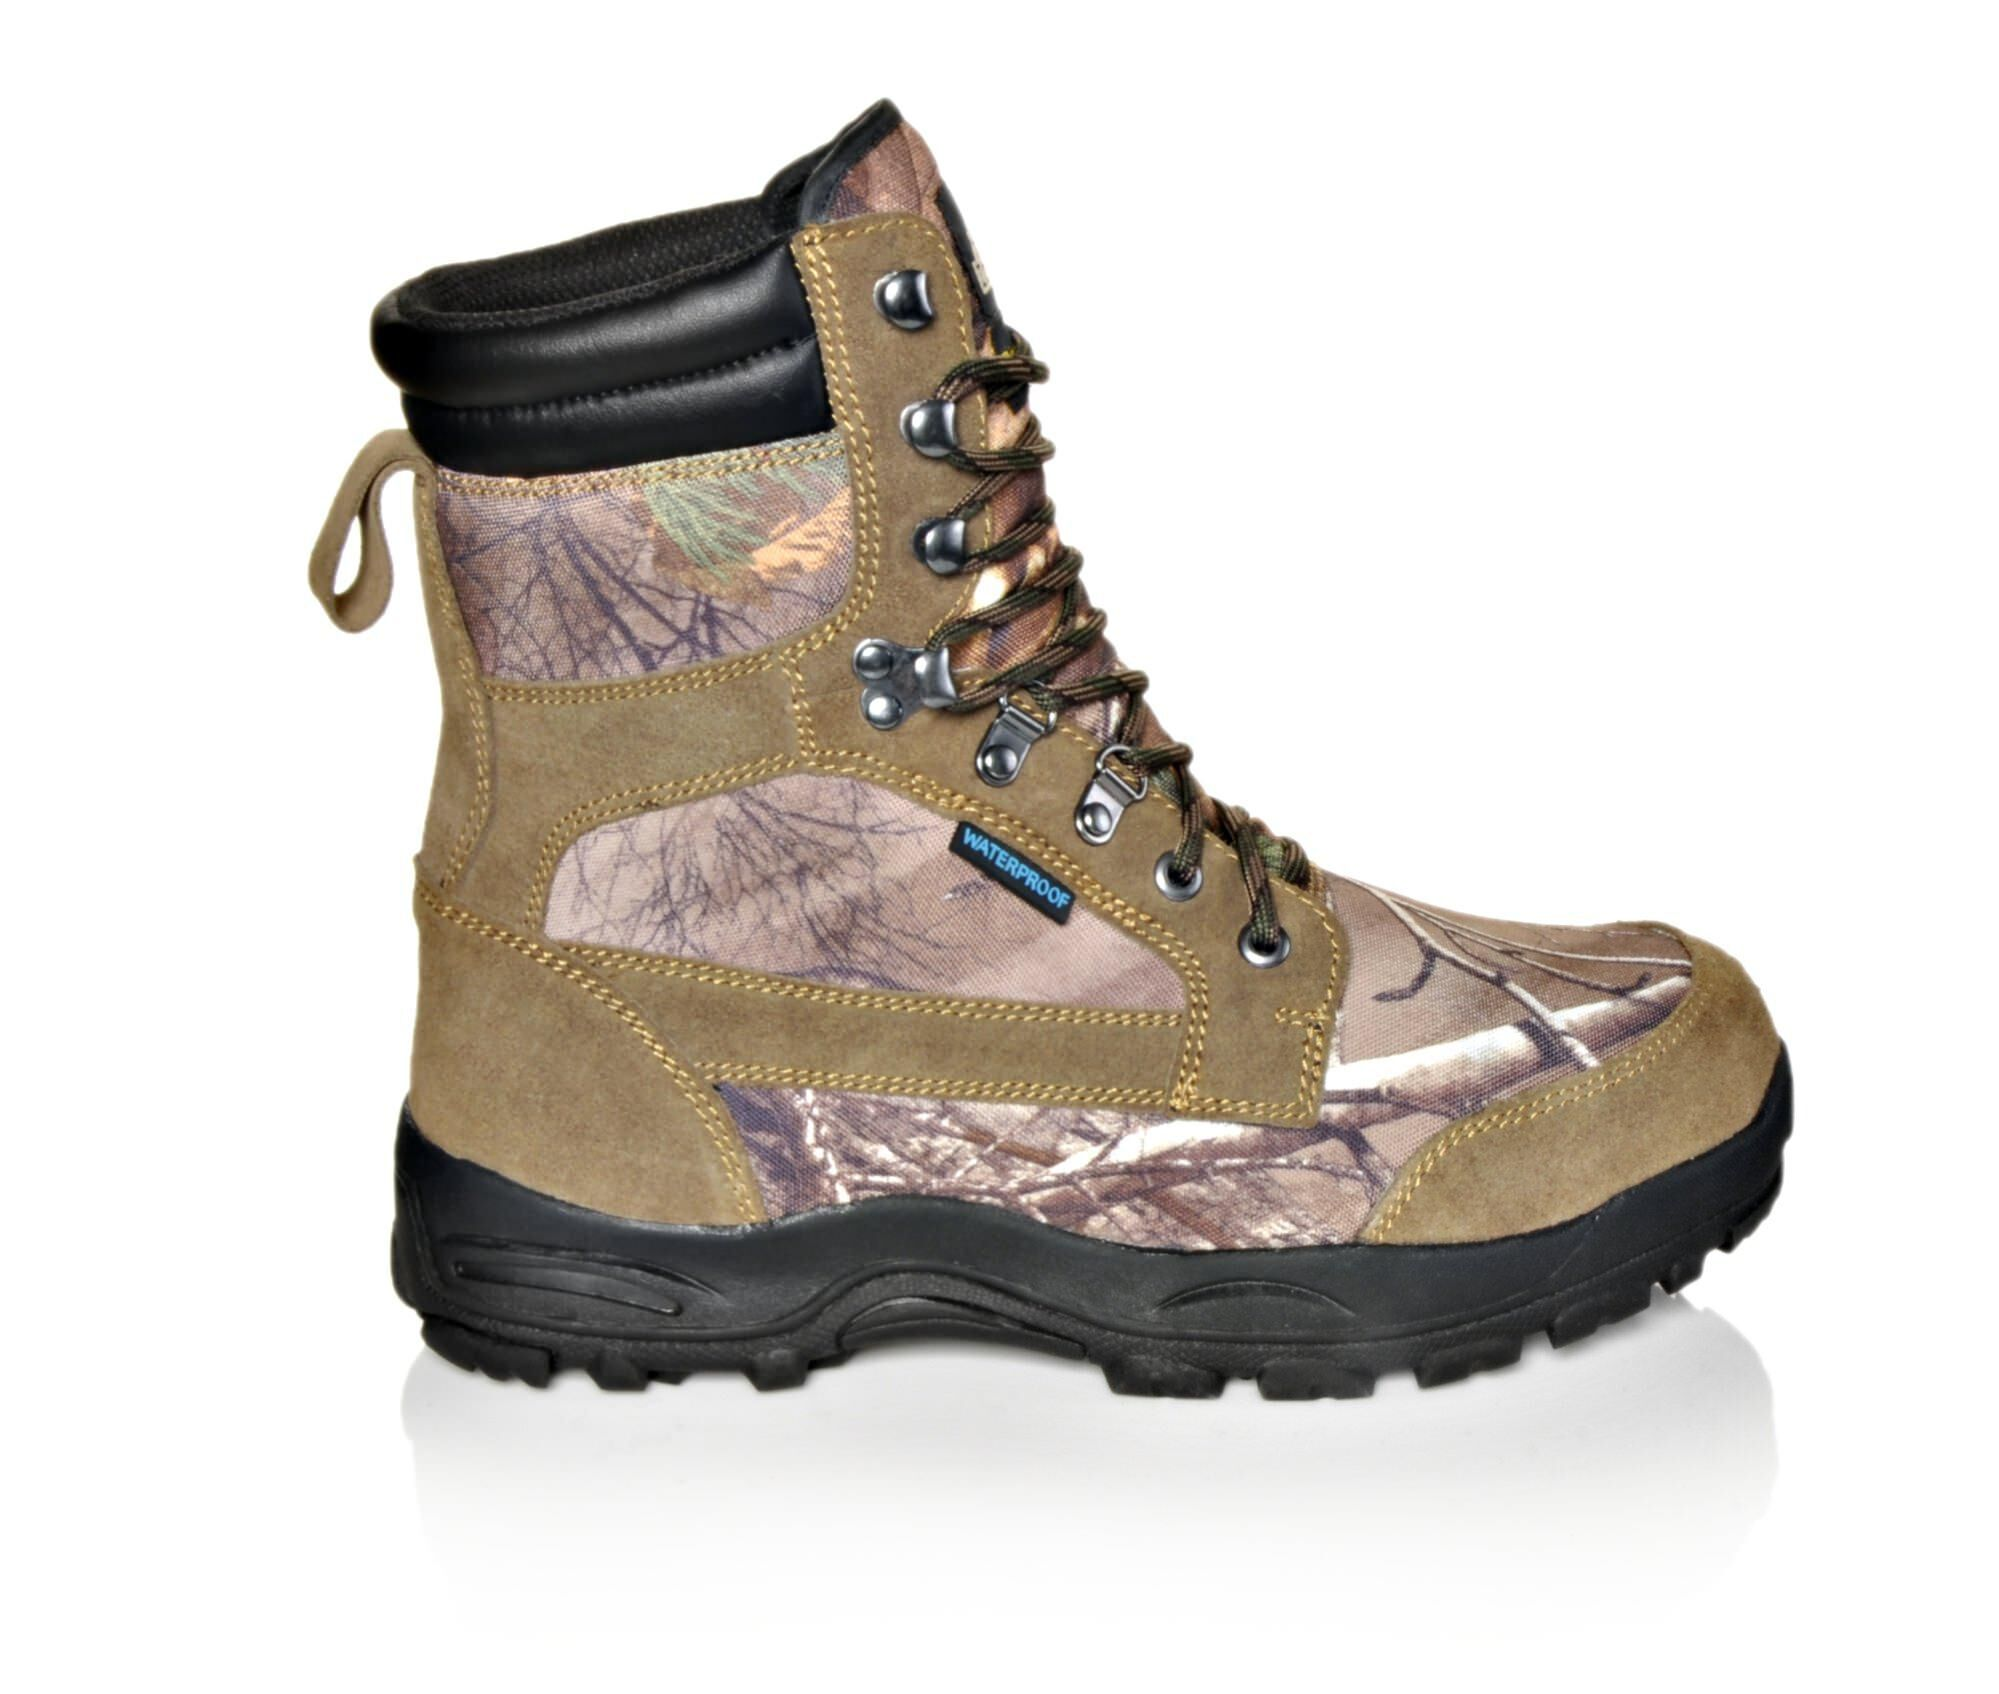 uk shoes_kd1243